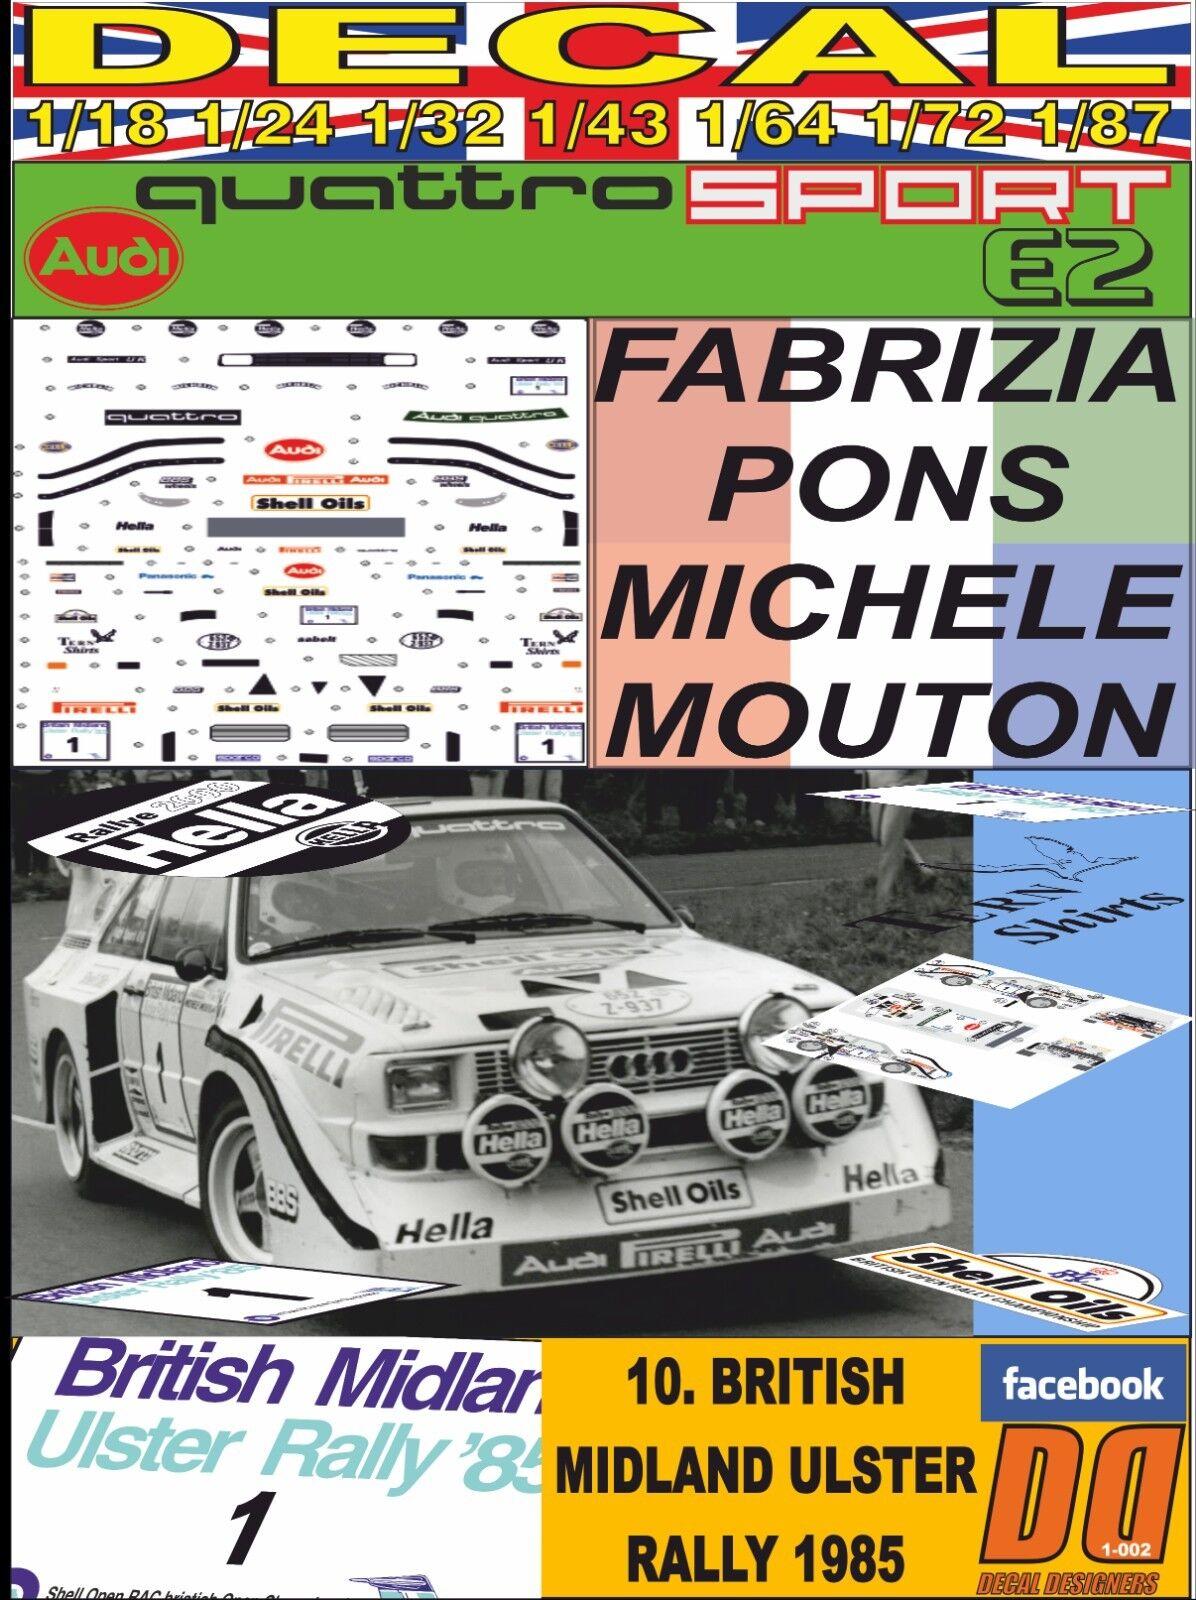 DECAL AUDI QUATTRO SPORT E2 MICHELLE MOUTON rally ULSTER 1985 DnF (06)